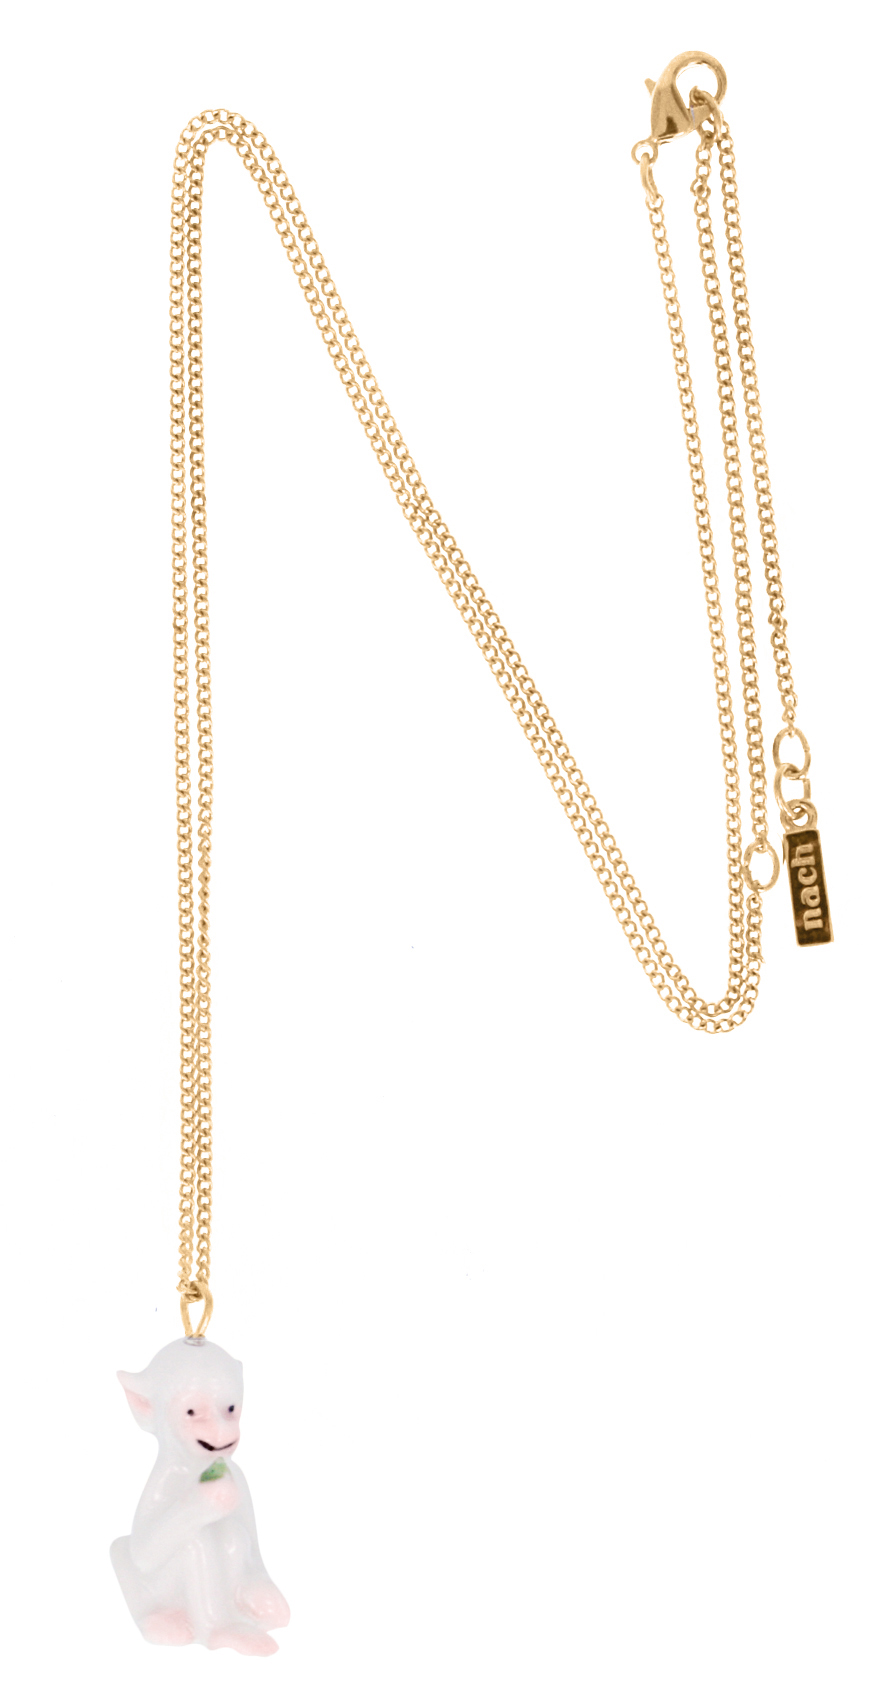 nach bijoux  U061G White Monkey mini necklace.jpg